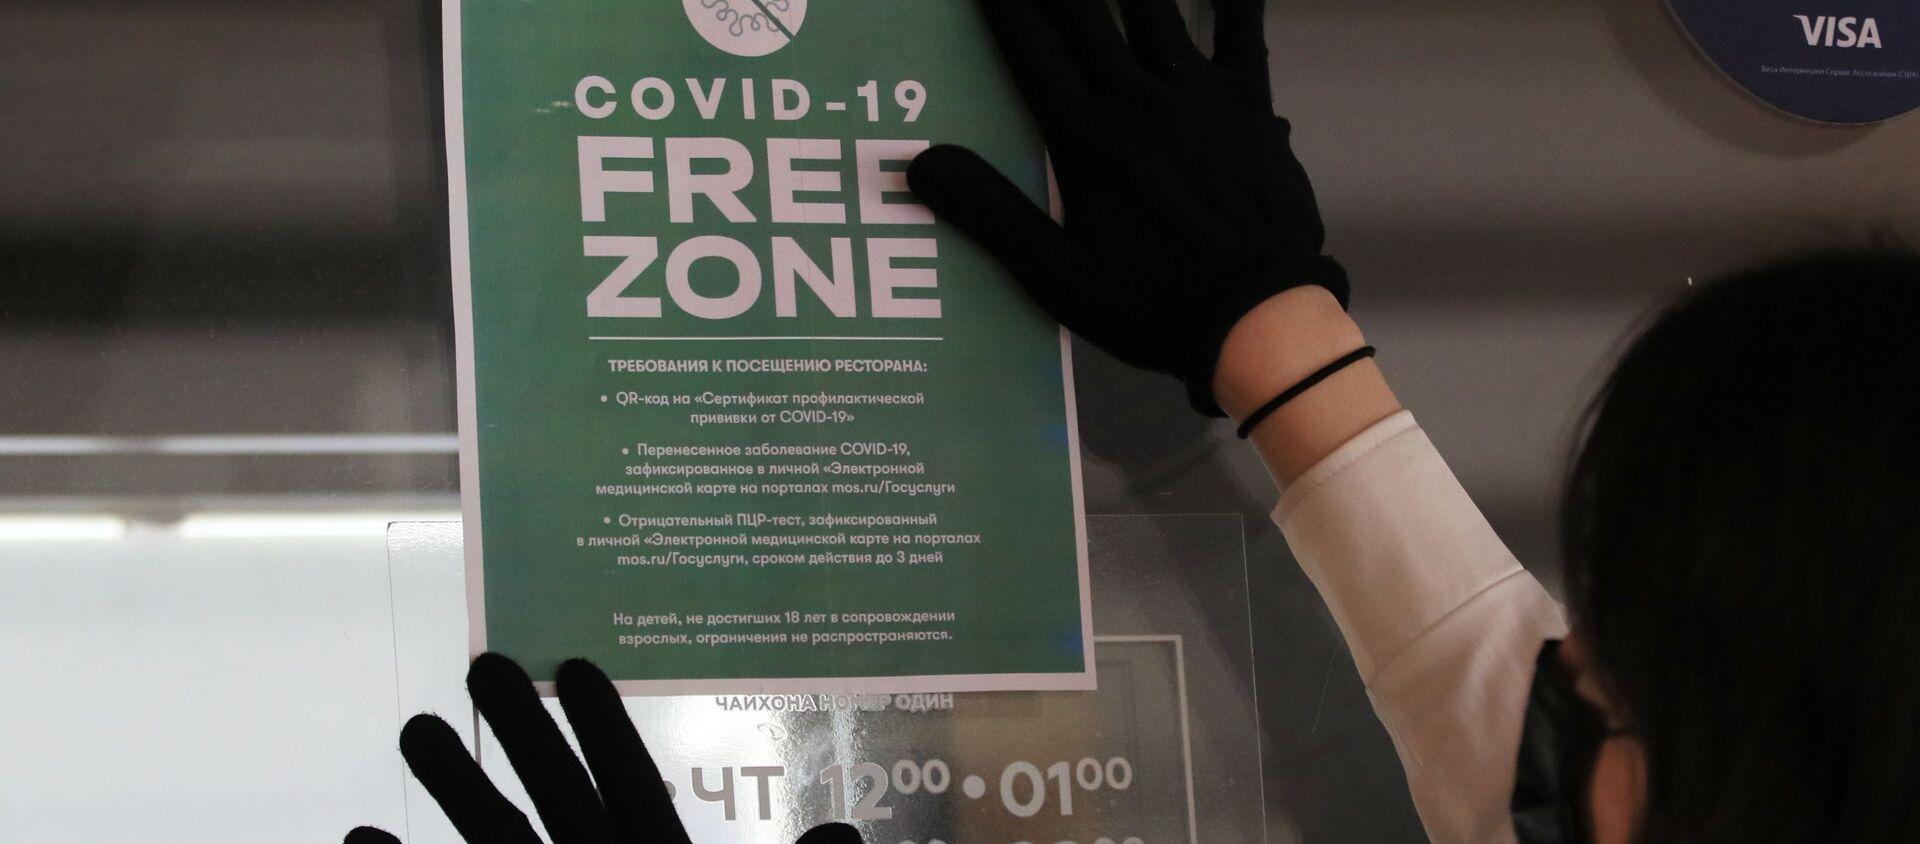 「COVID-19 Free Zone」サイン - Sputnik 日本, 1920, 23.09.2021